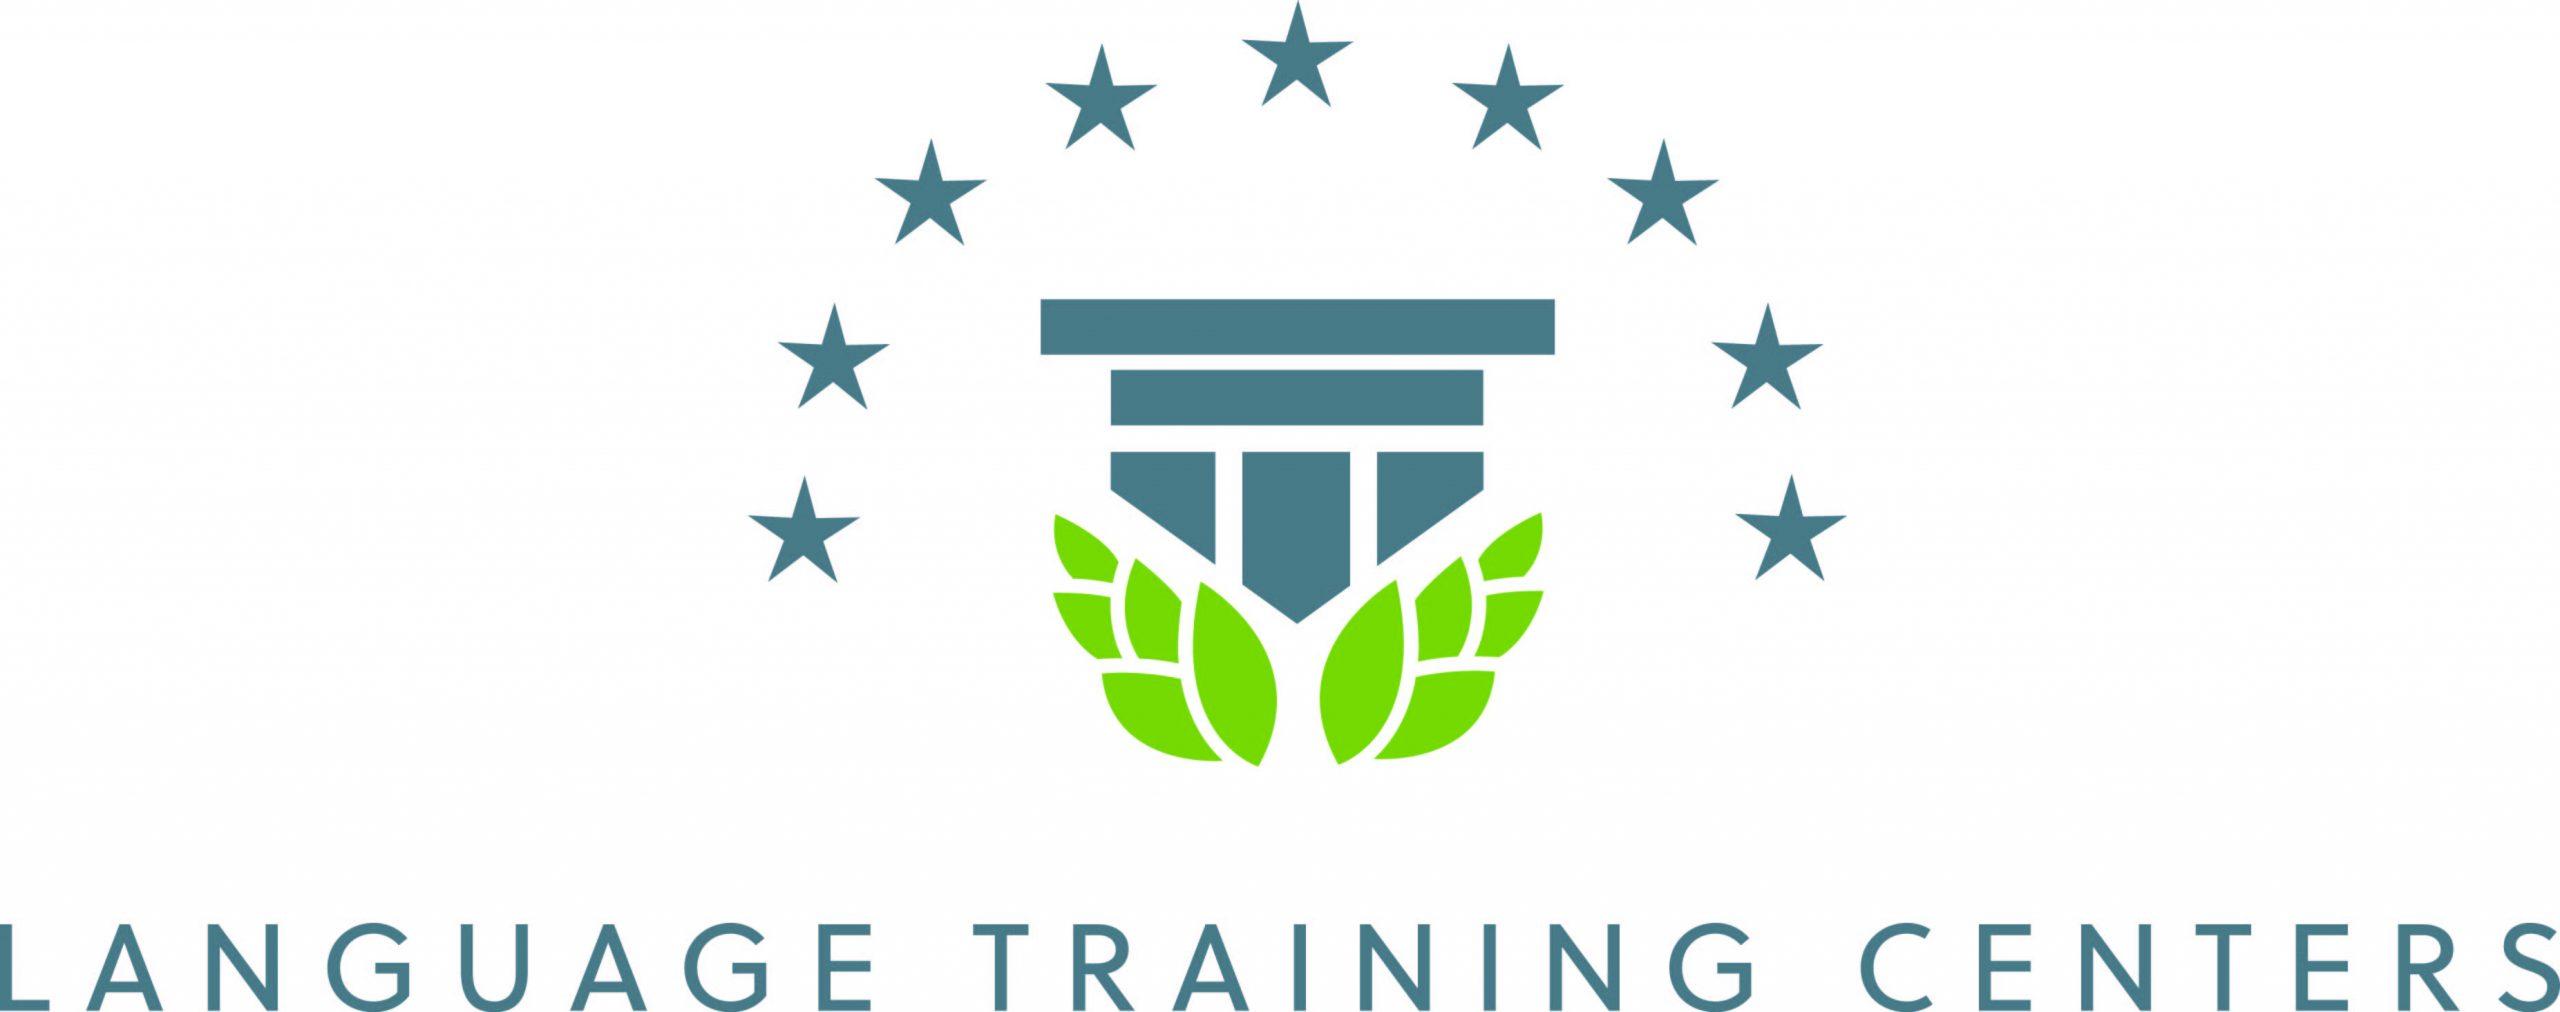 LTC logo image